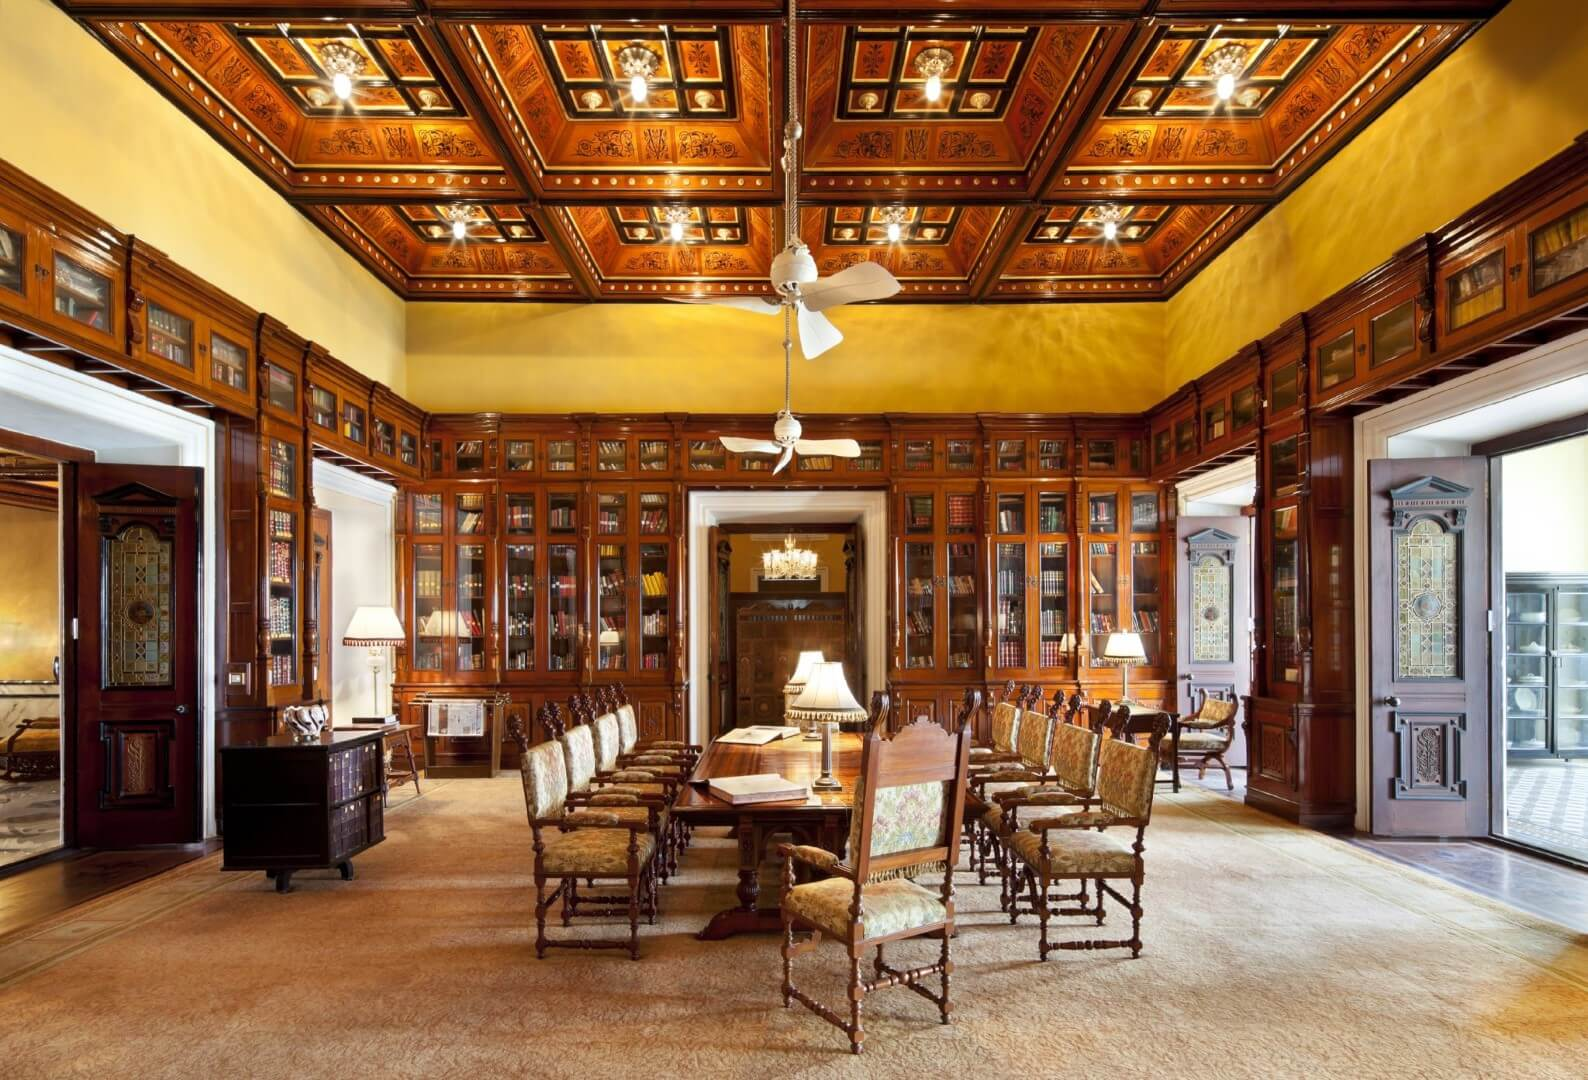 mejores hoteles con biblioteca Taj Falaknuma Palace